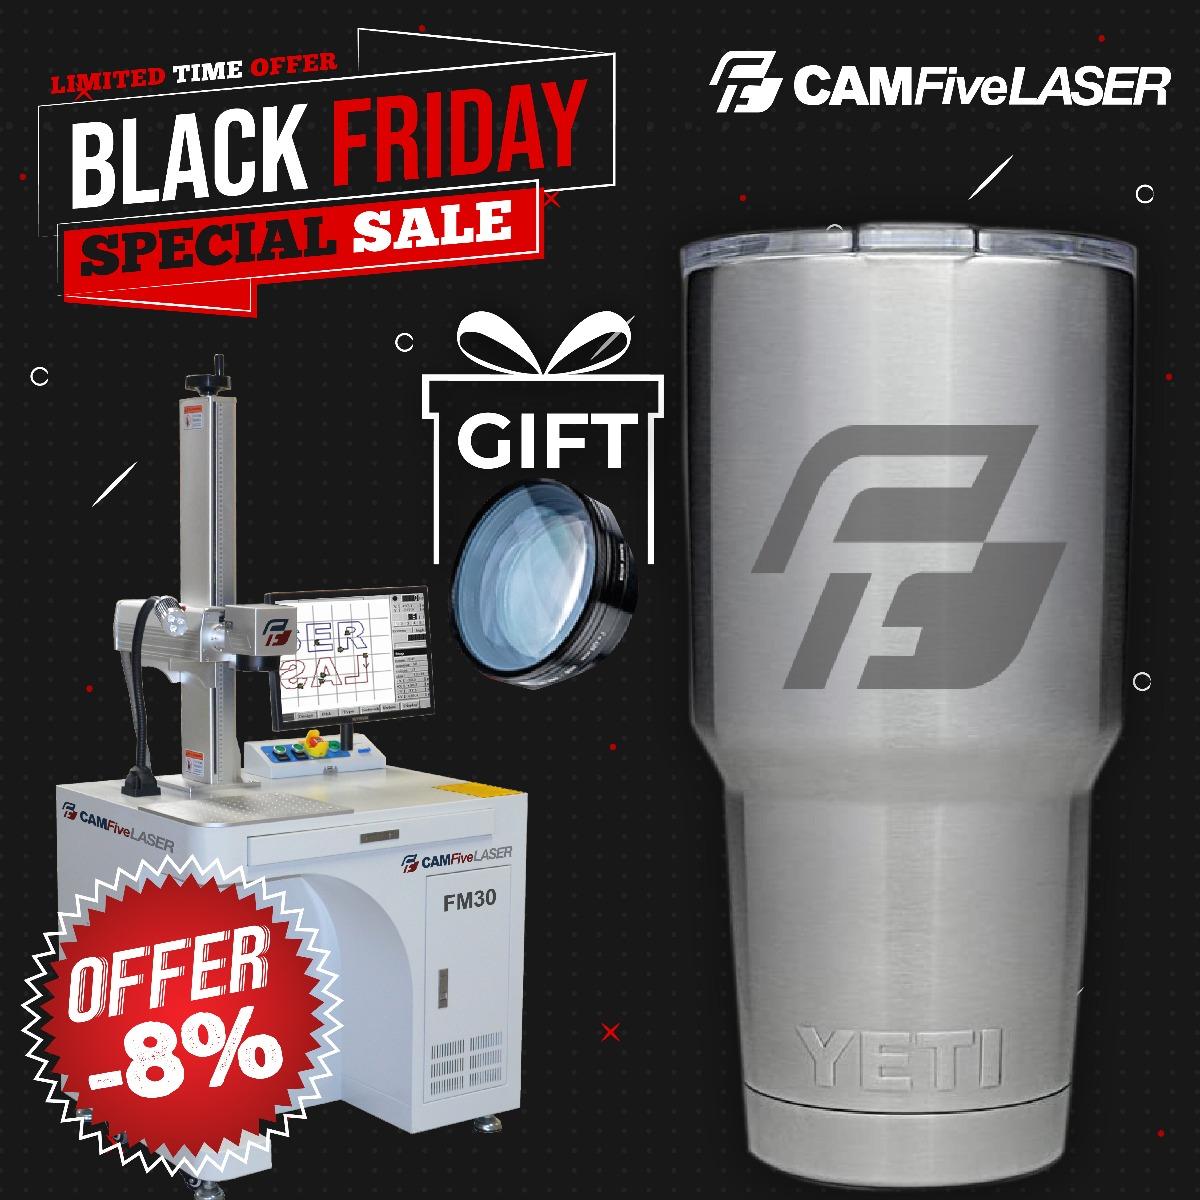 Bordadora Camfive EMB - Black Friday